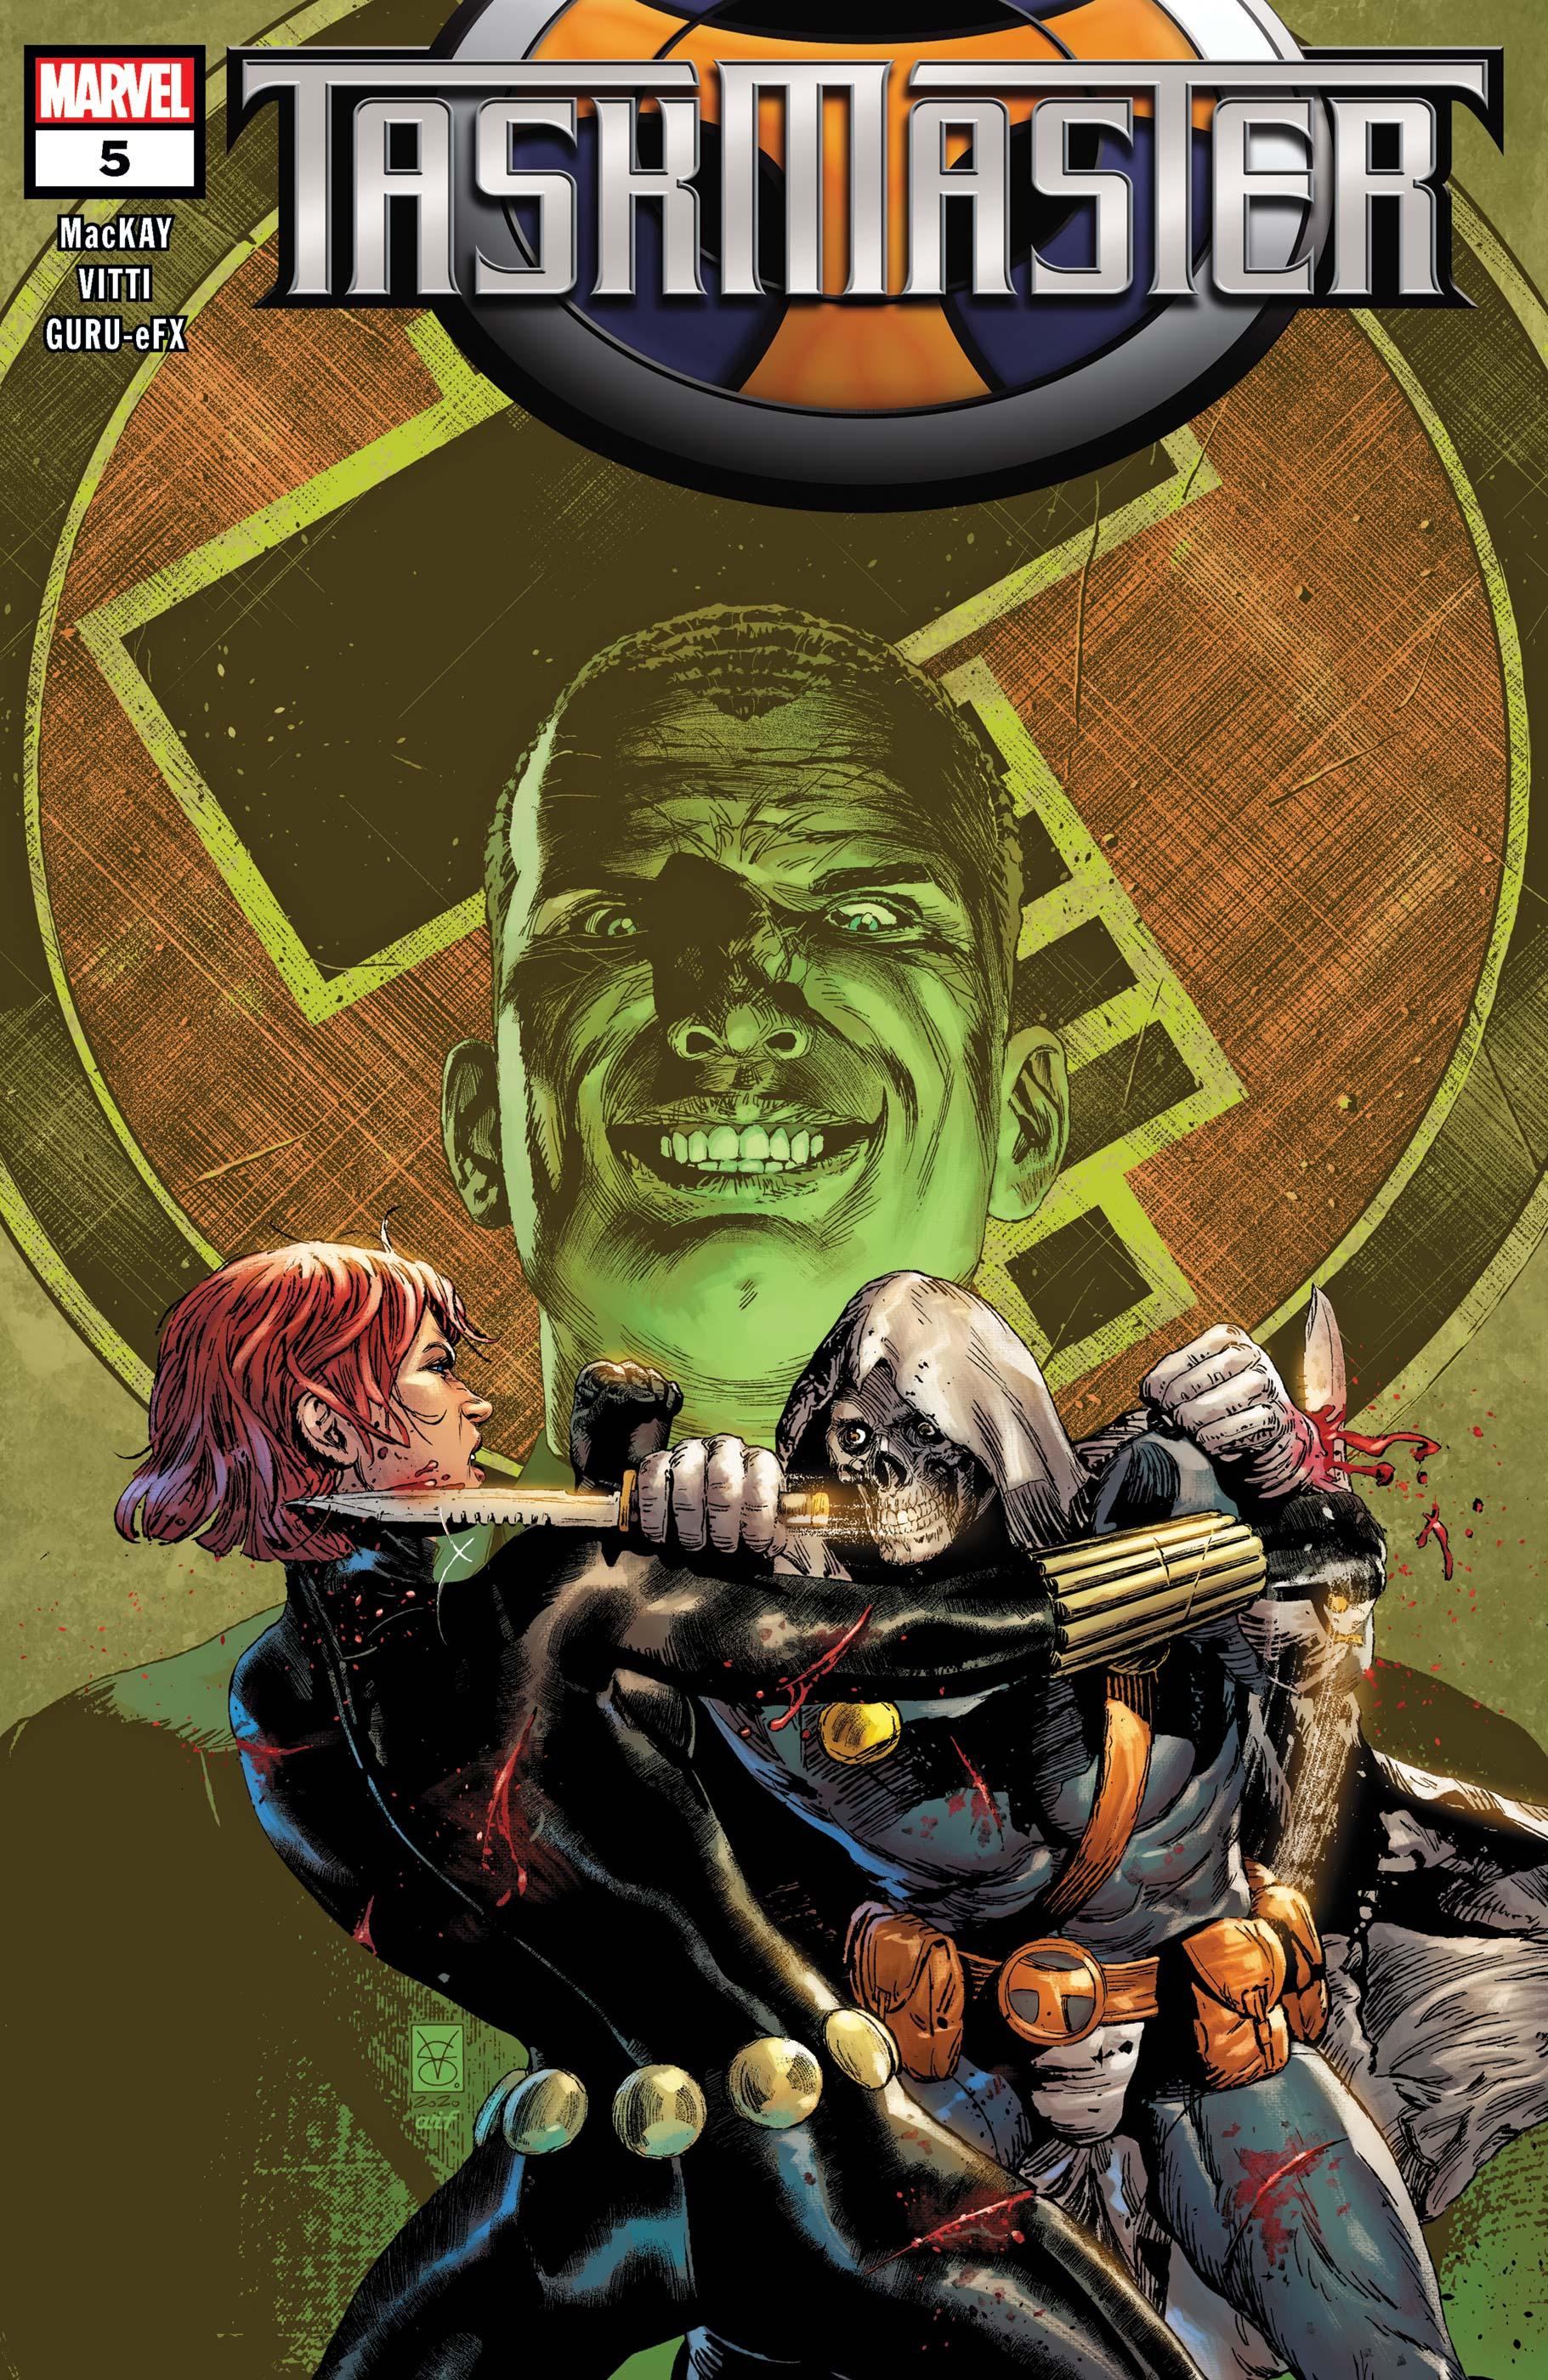 Taskmaster (2020) #5